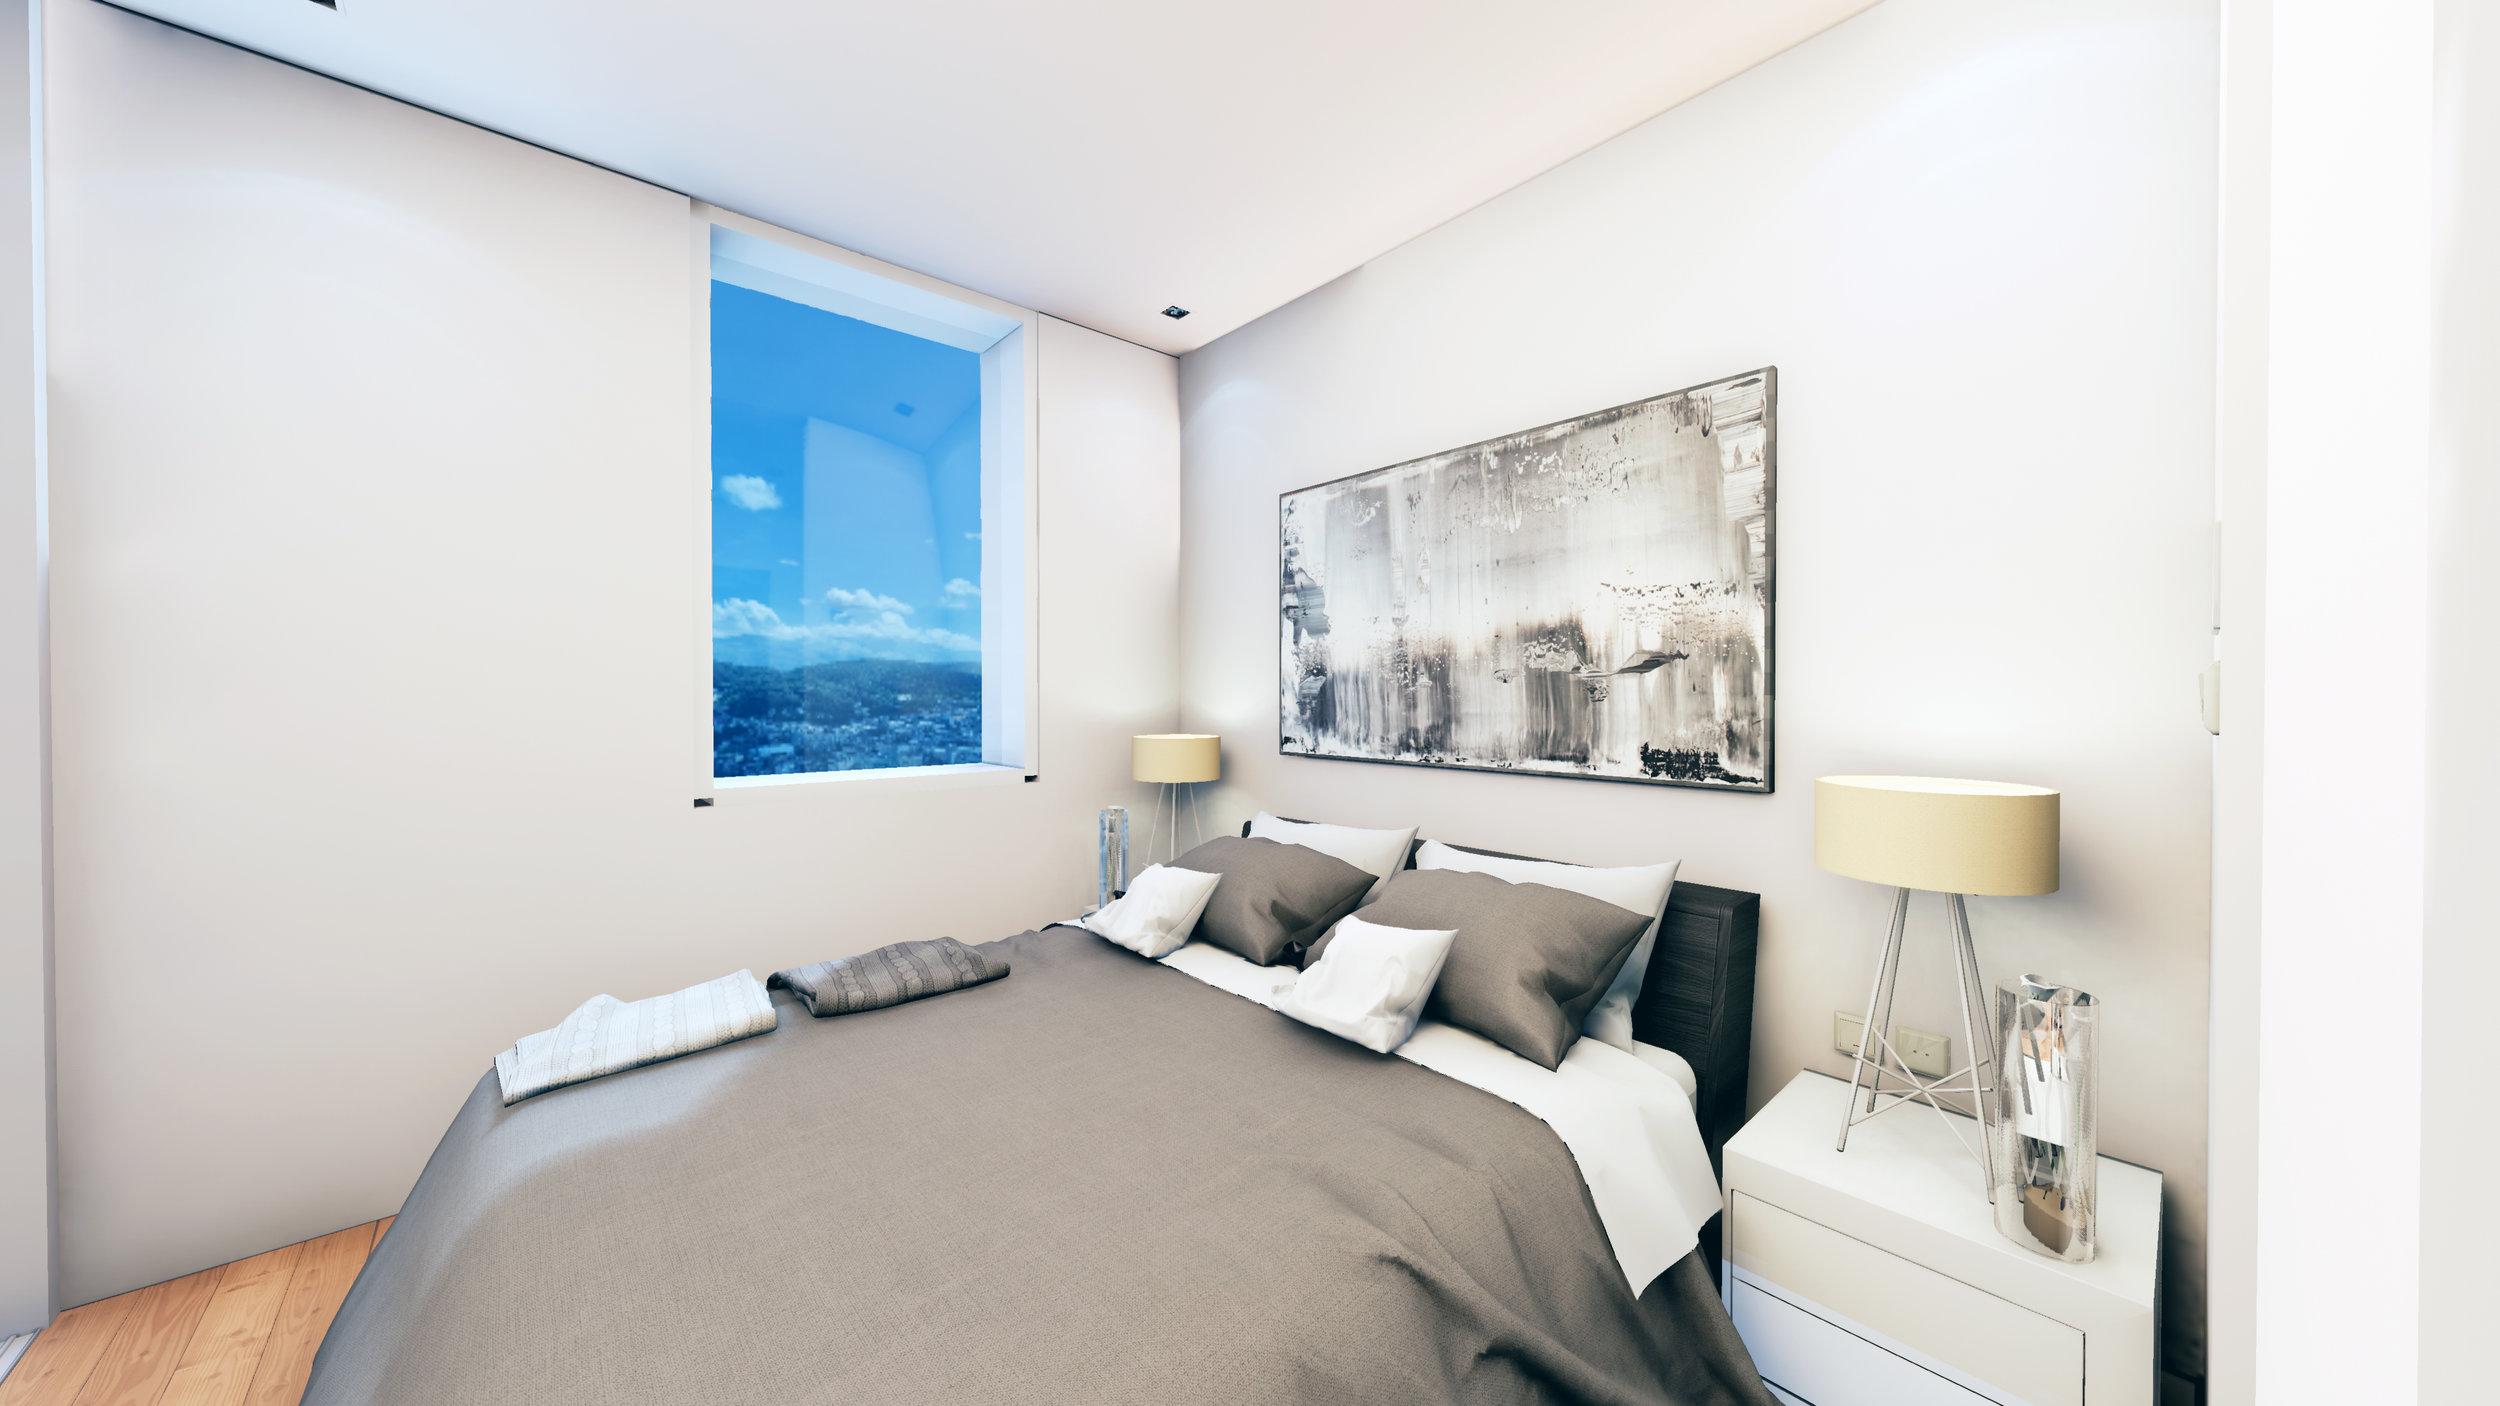 Apartment02_0002.jpg